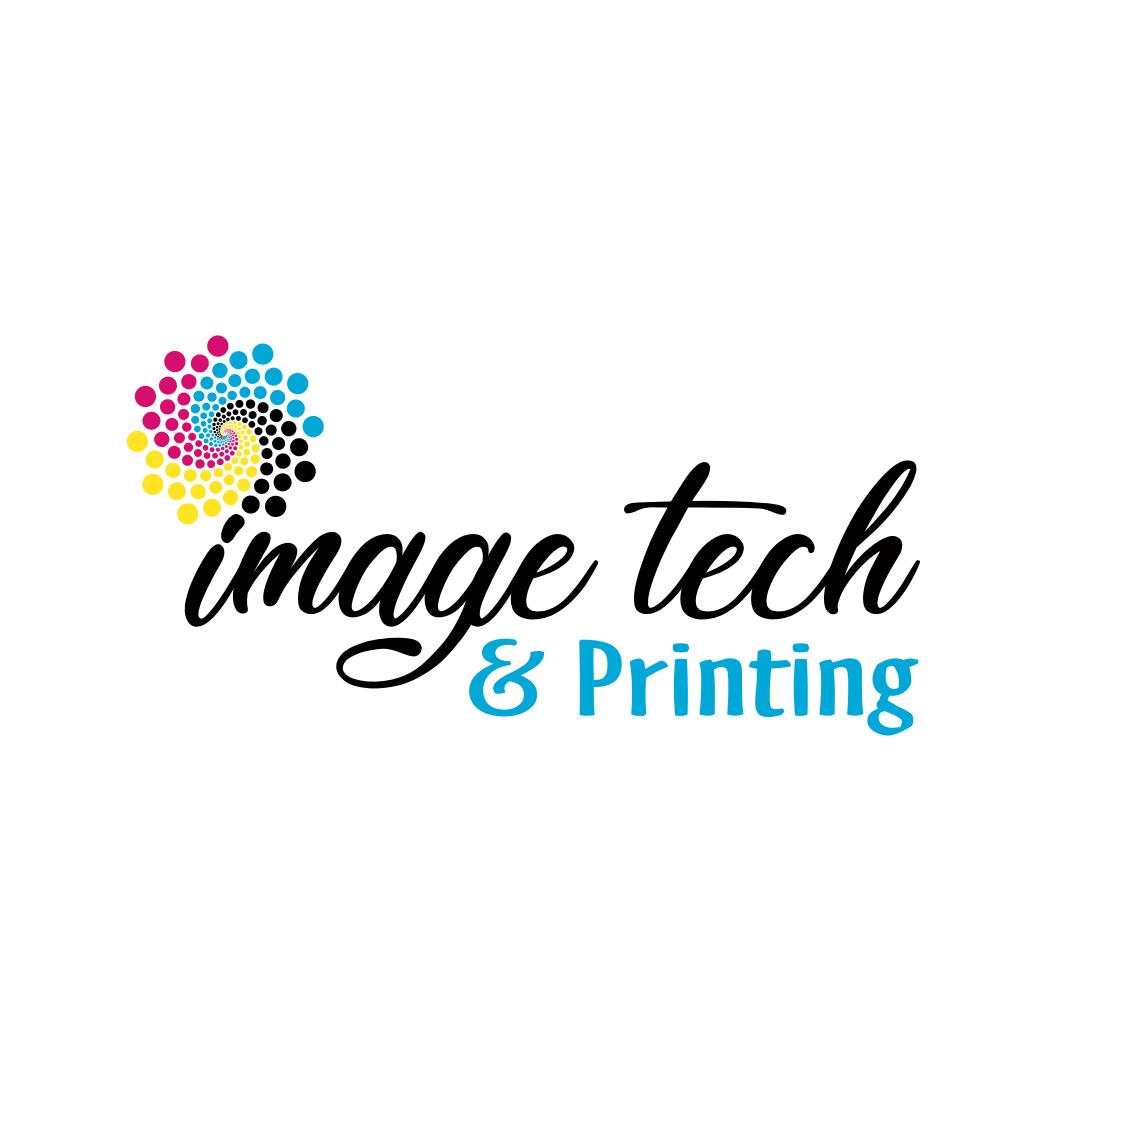 Image Tech & Printing